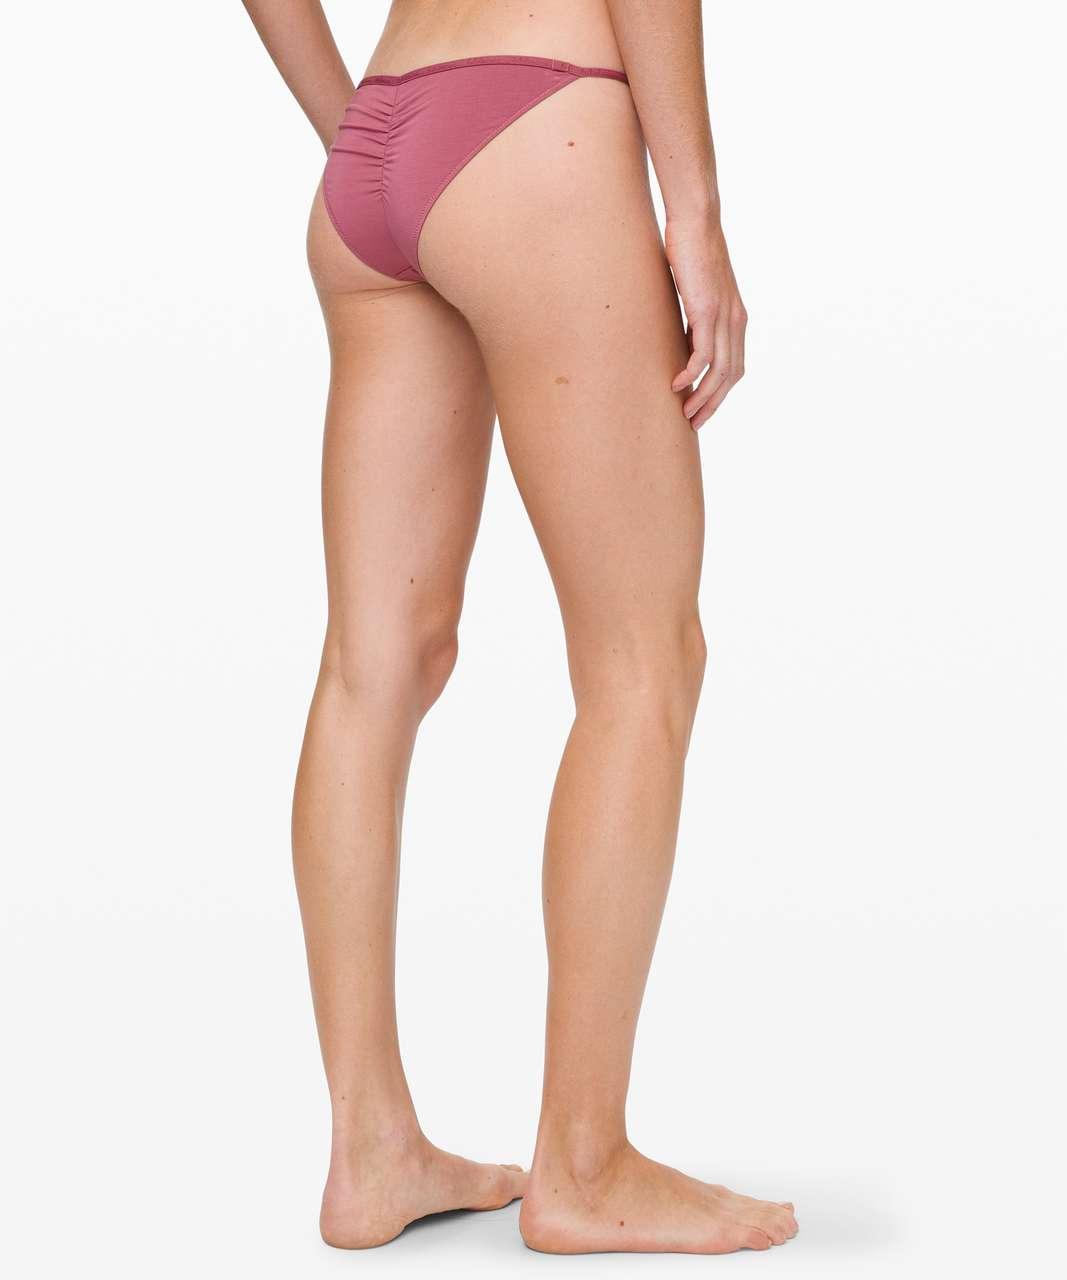 Lululemon Simply There Cheeky Bikini - Moss Rose